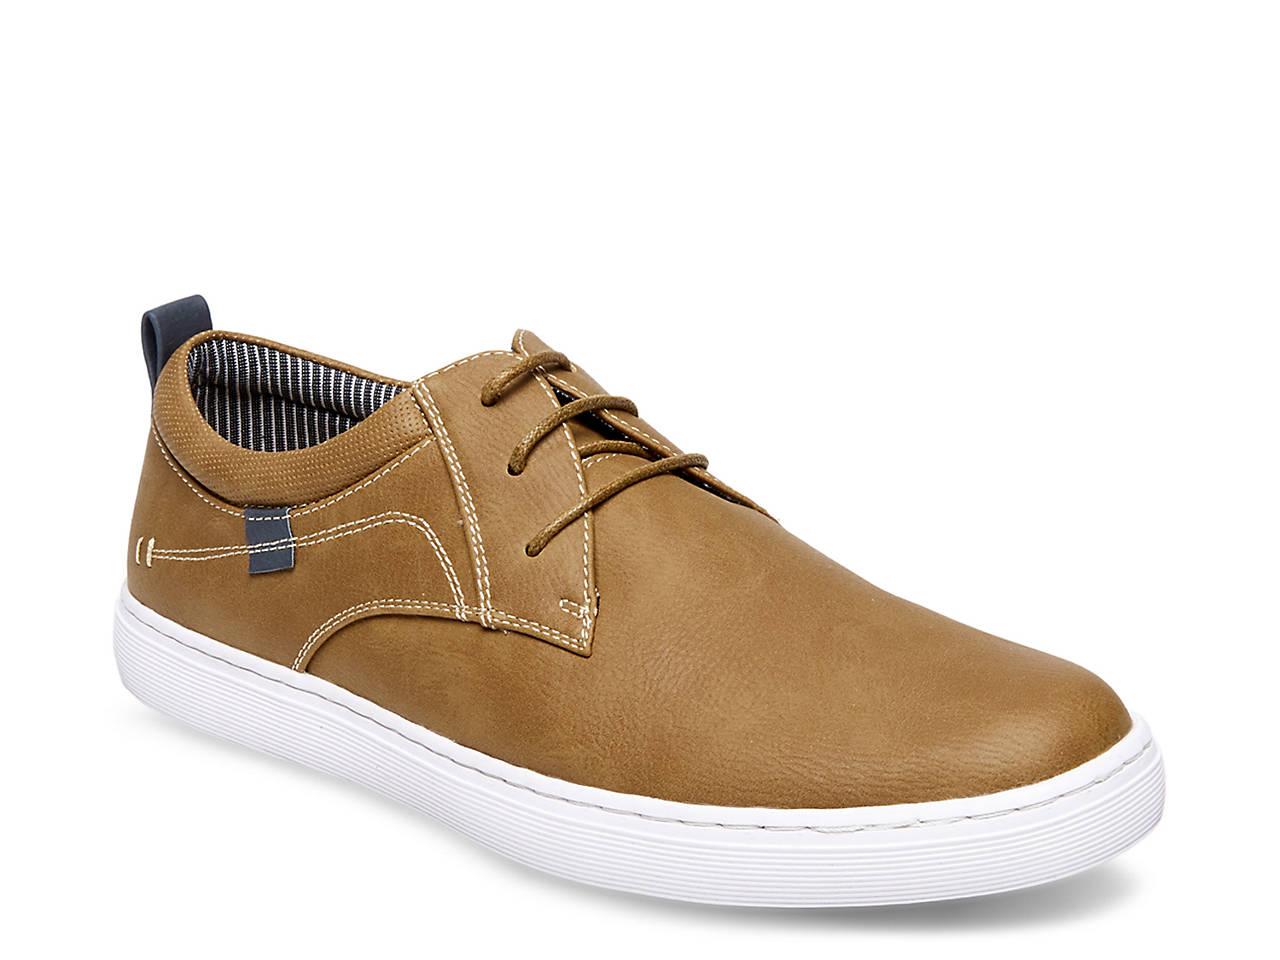 069f93b2f58 Steve Madden Instax Sneaker Men s Shoes